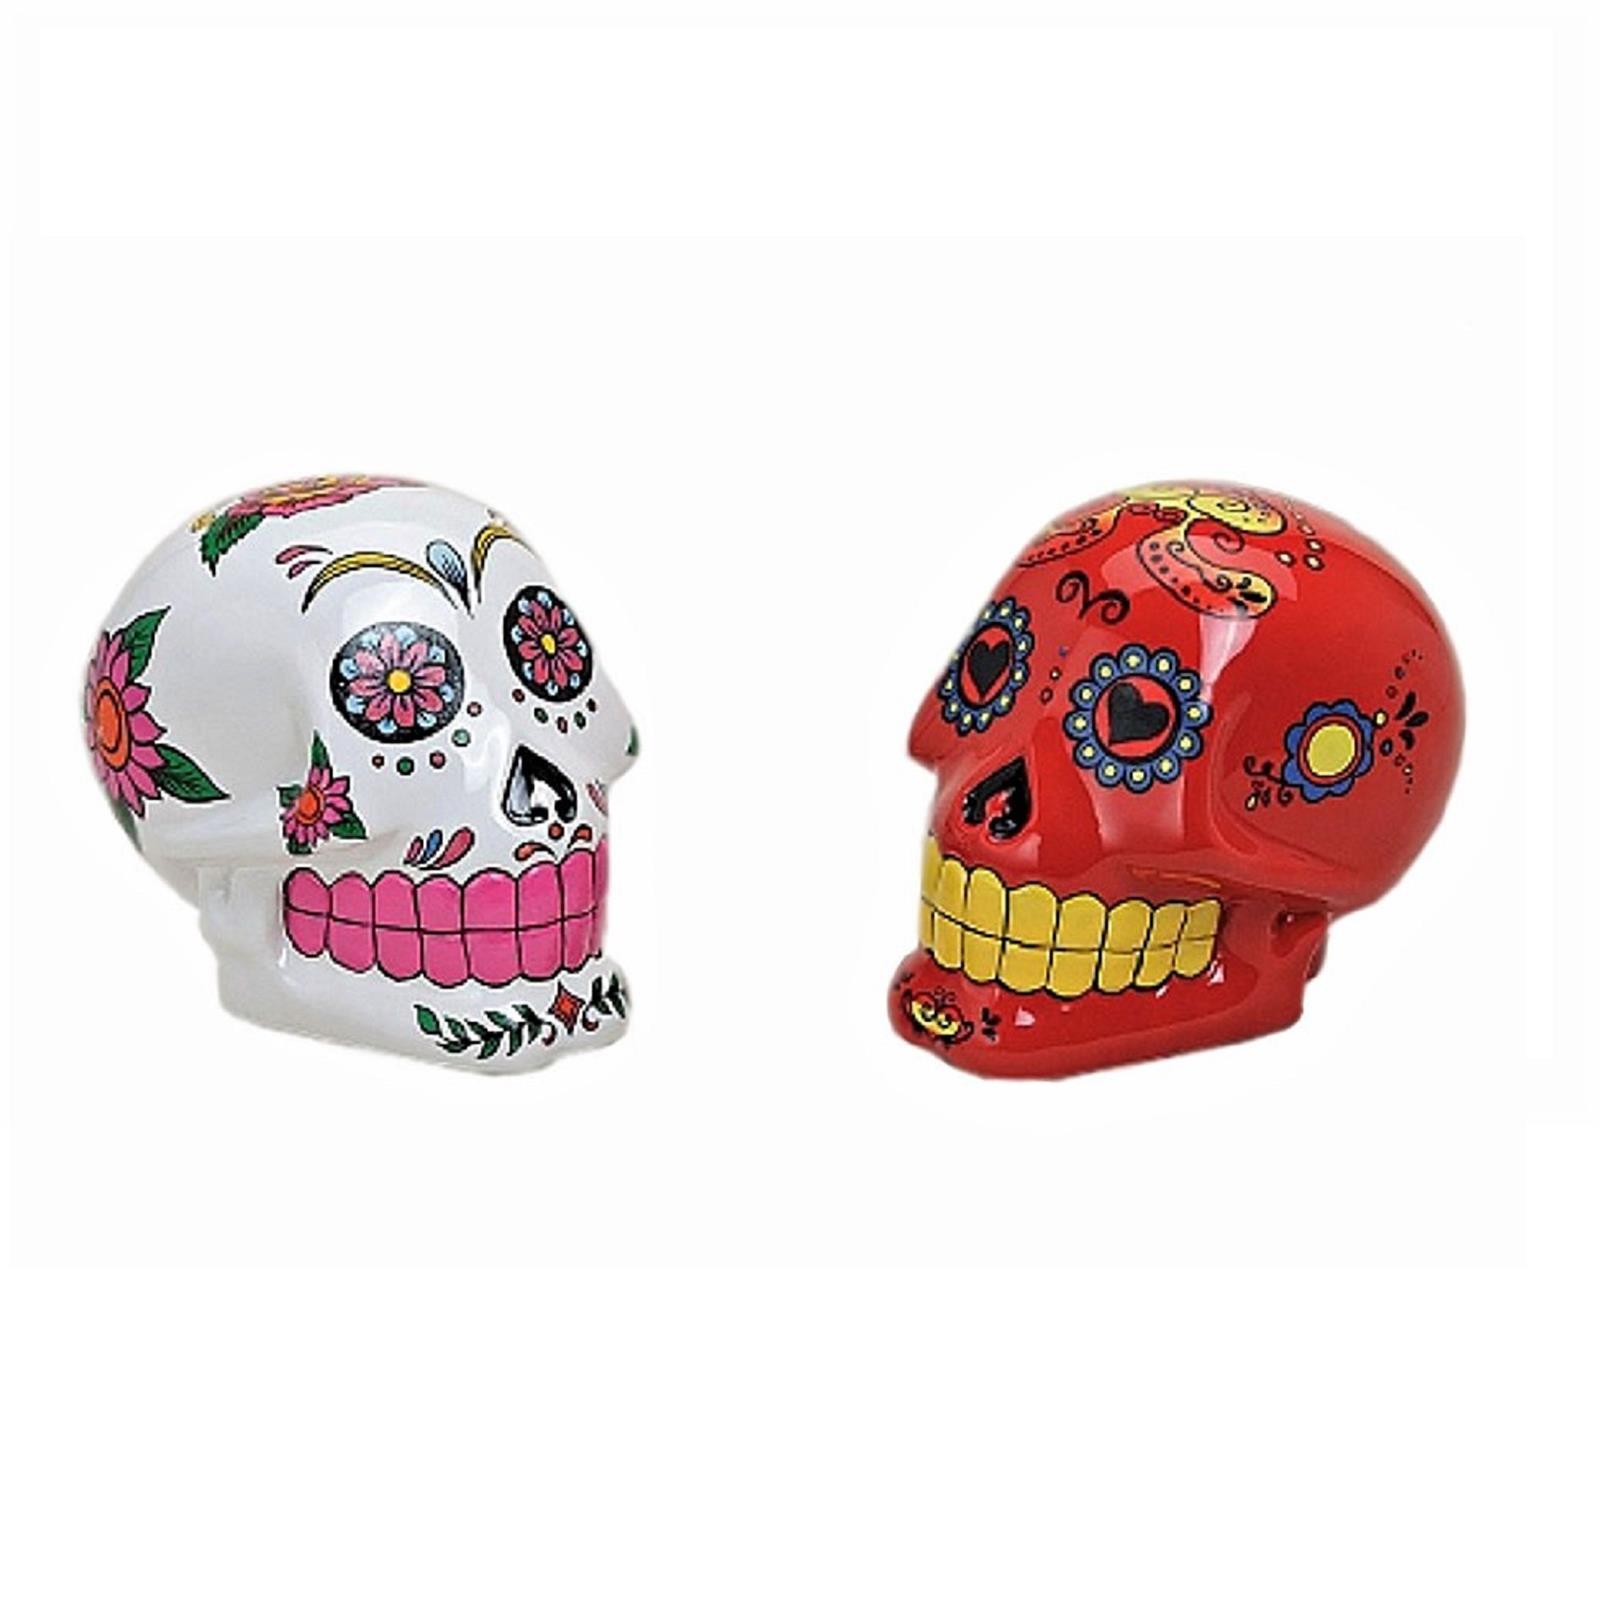 Spardose Sugar Skull